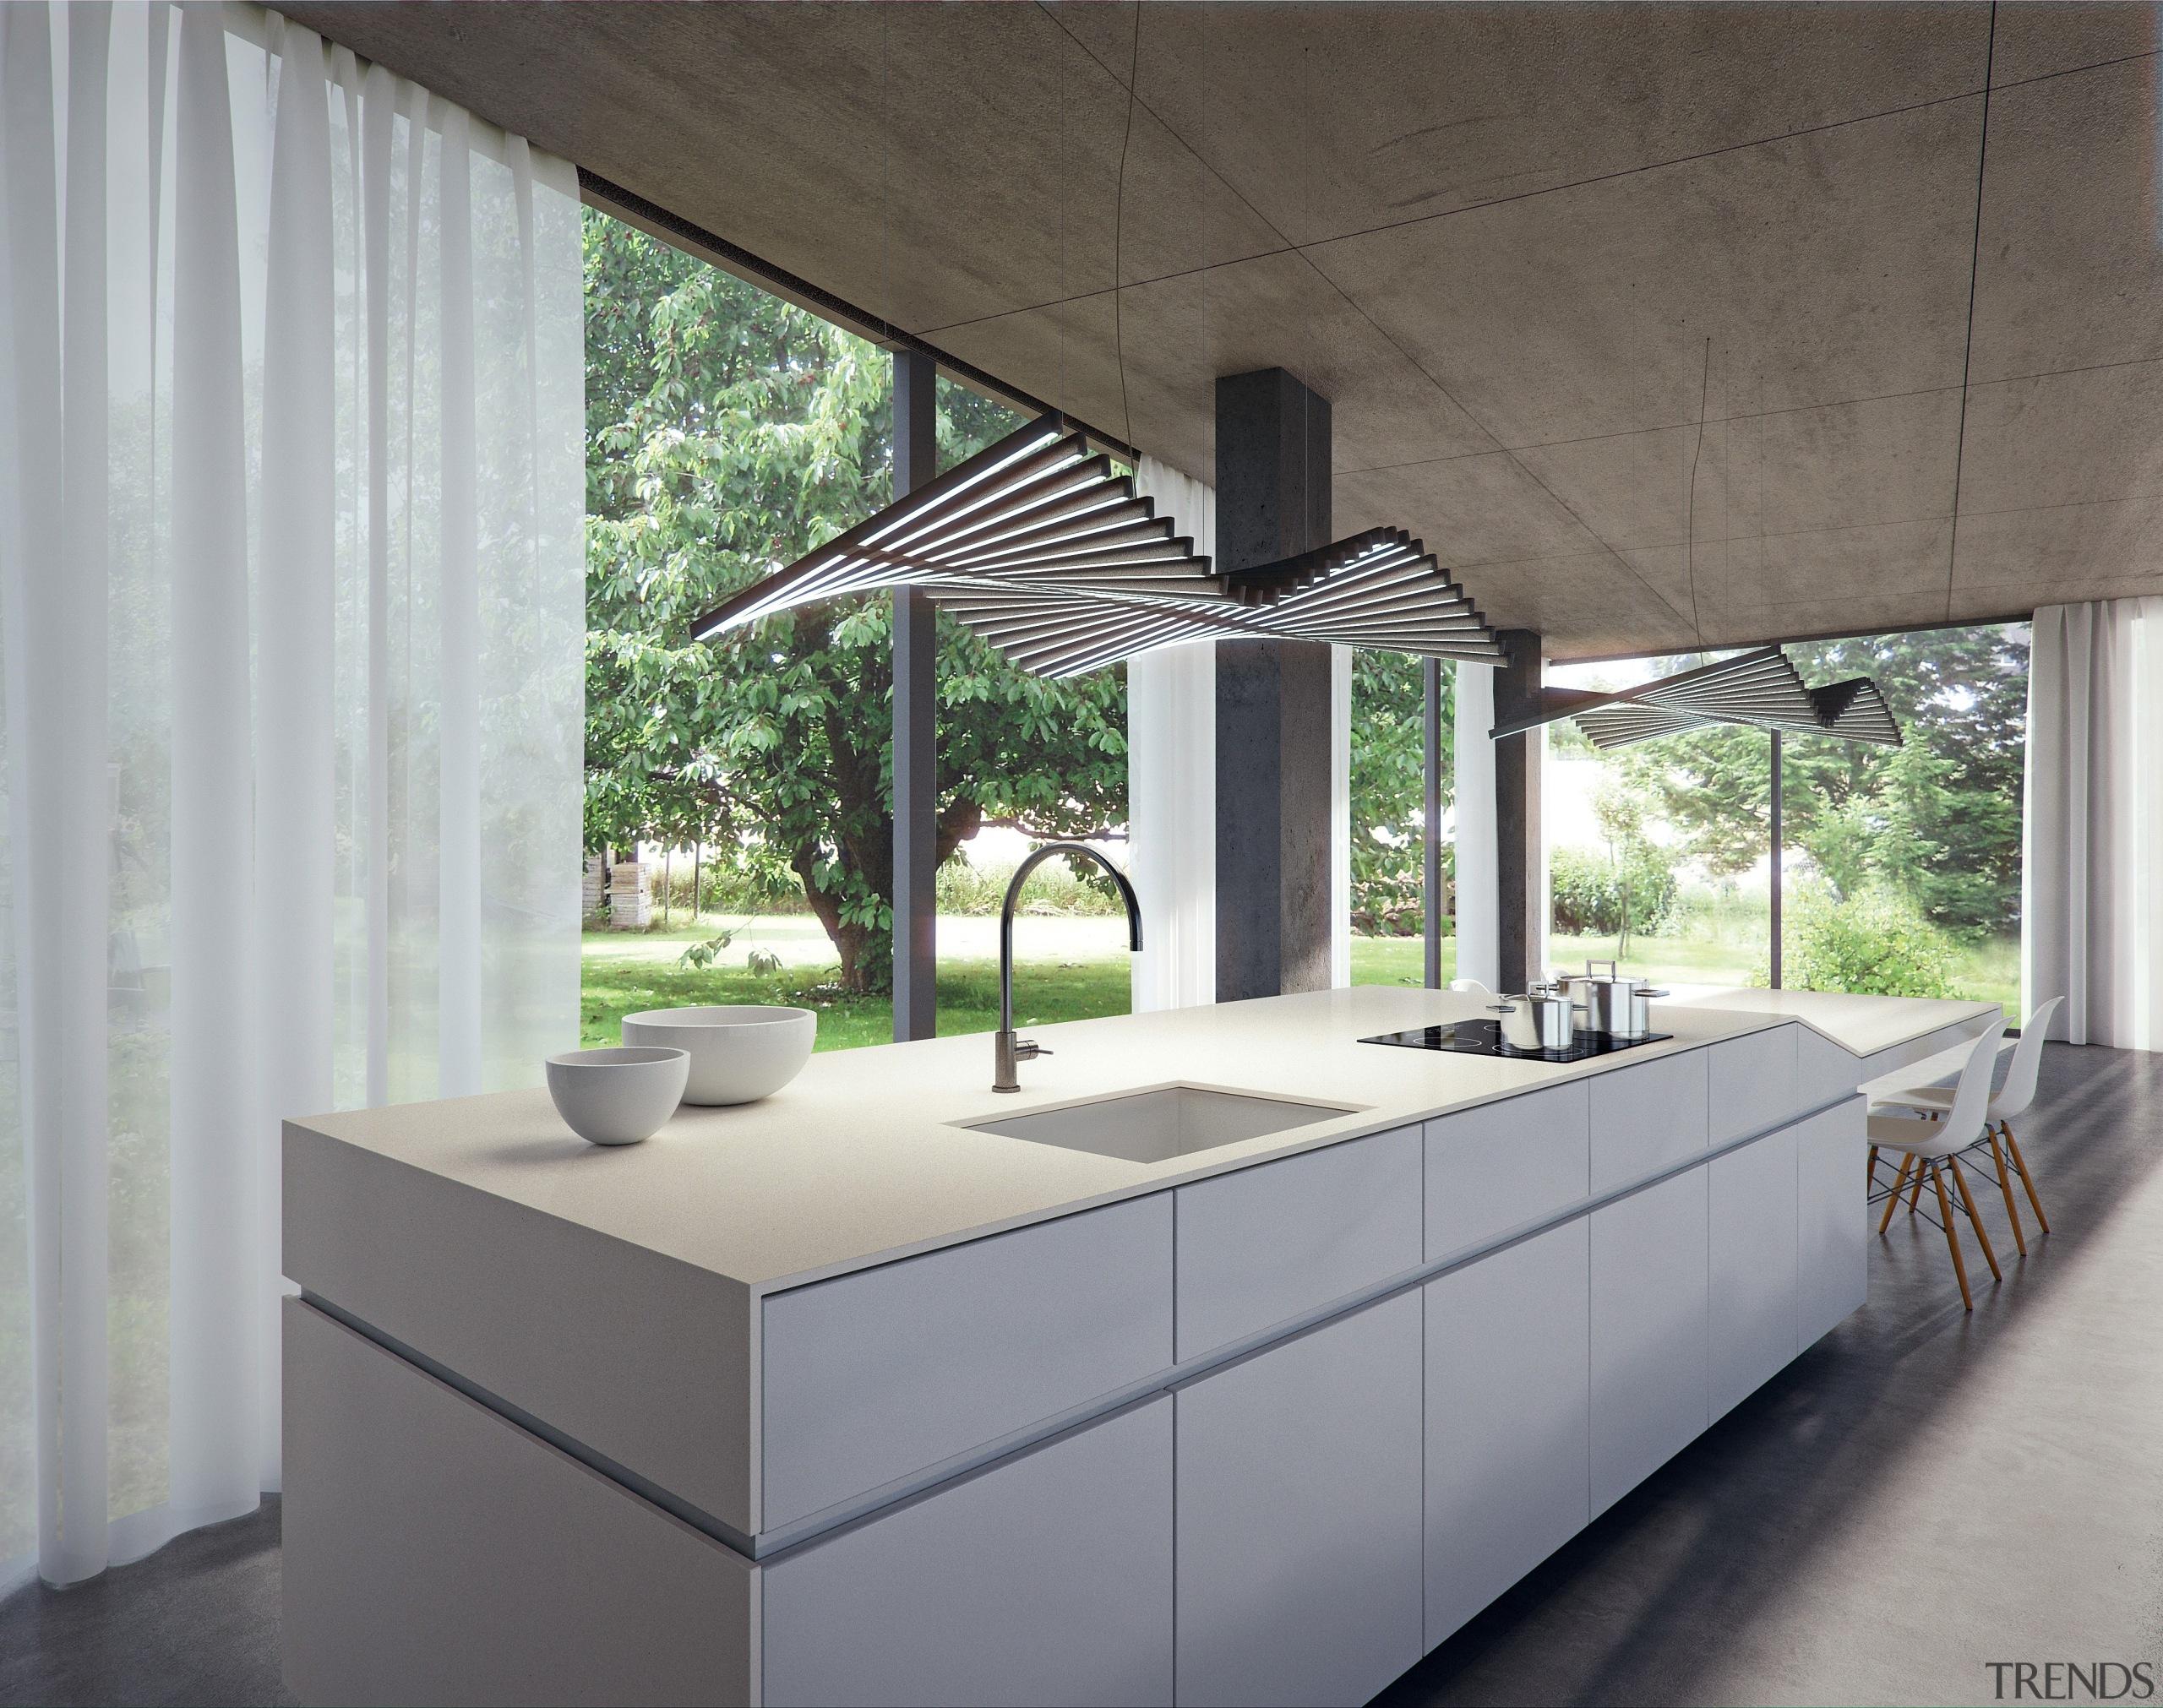 4001freshconcreterender.jpg - 4001freshconcreterender.jpg - architecture | daylighting | architecture, daylighting, house, interior design, real estate, gray